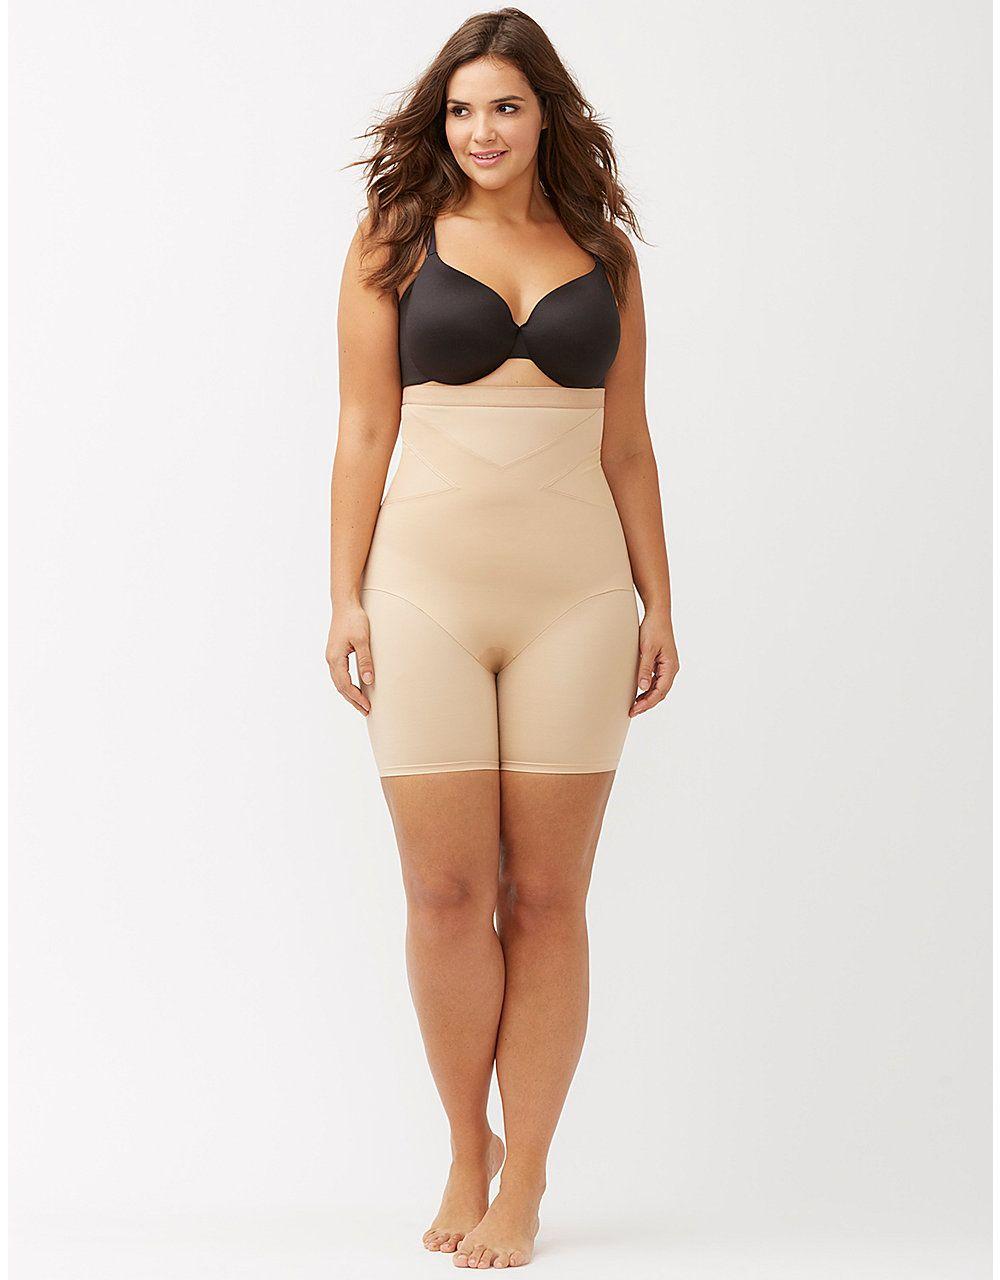 a1e1495282 High waist thigh shaper by Shape by Cacique